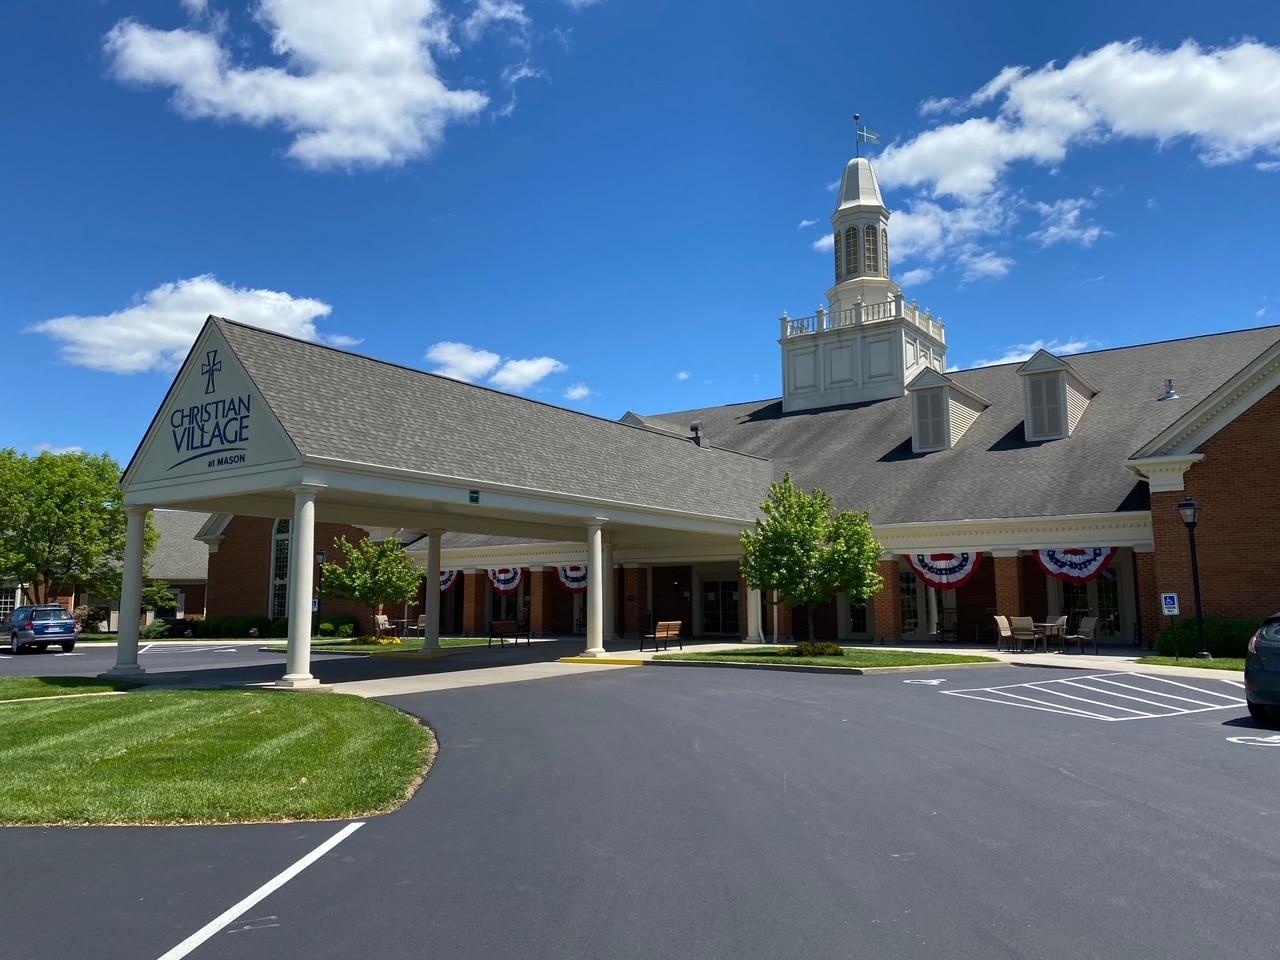 Christian Village Stone Worship Center_Mason Ohio - Hargett_5-8-21 - 14